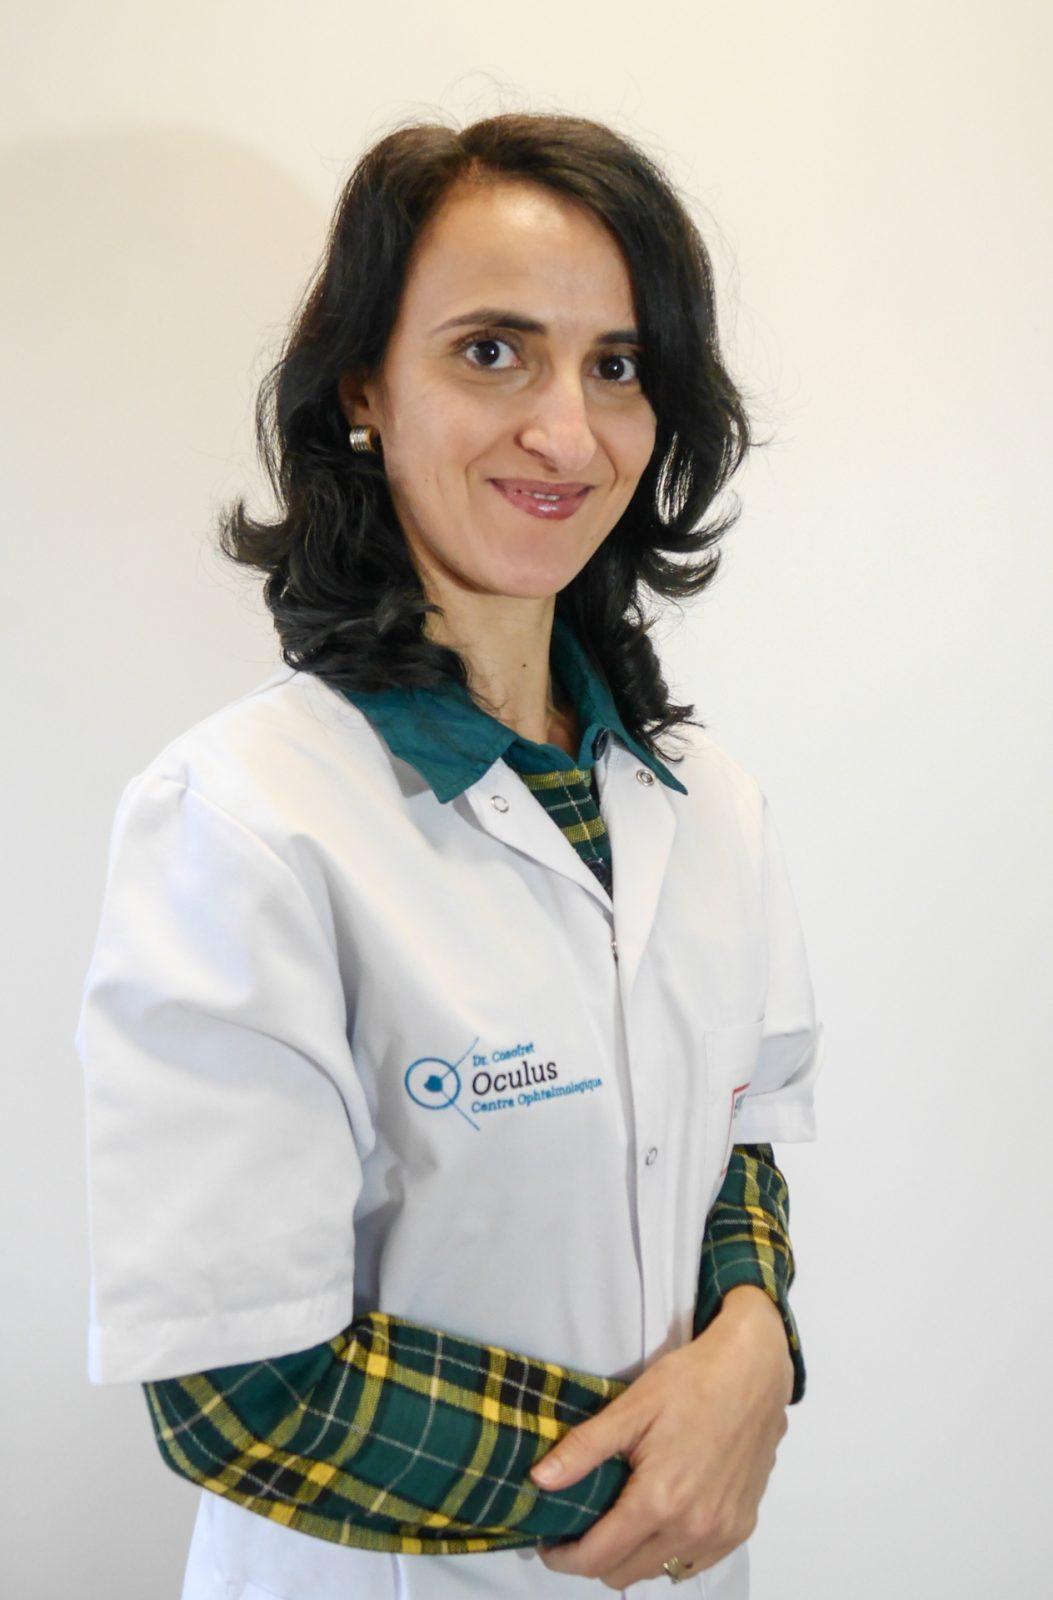 Dr Despina Cosofret